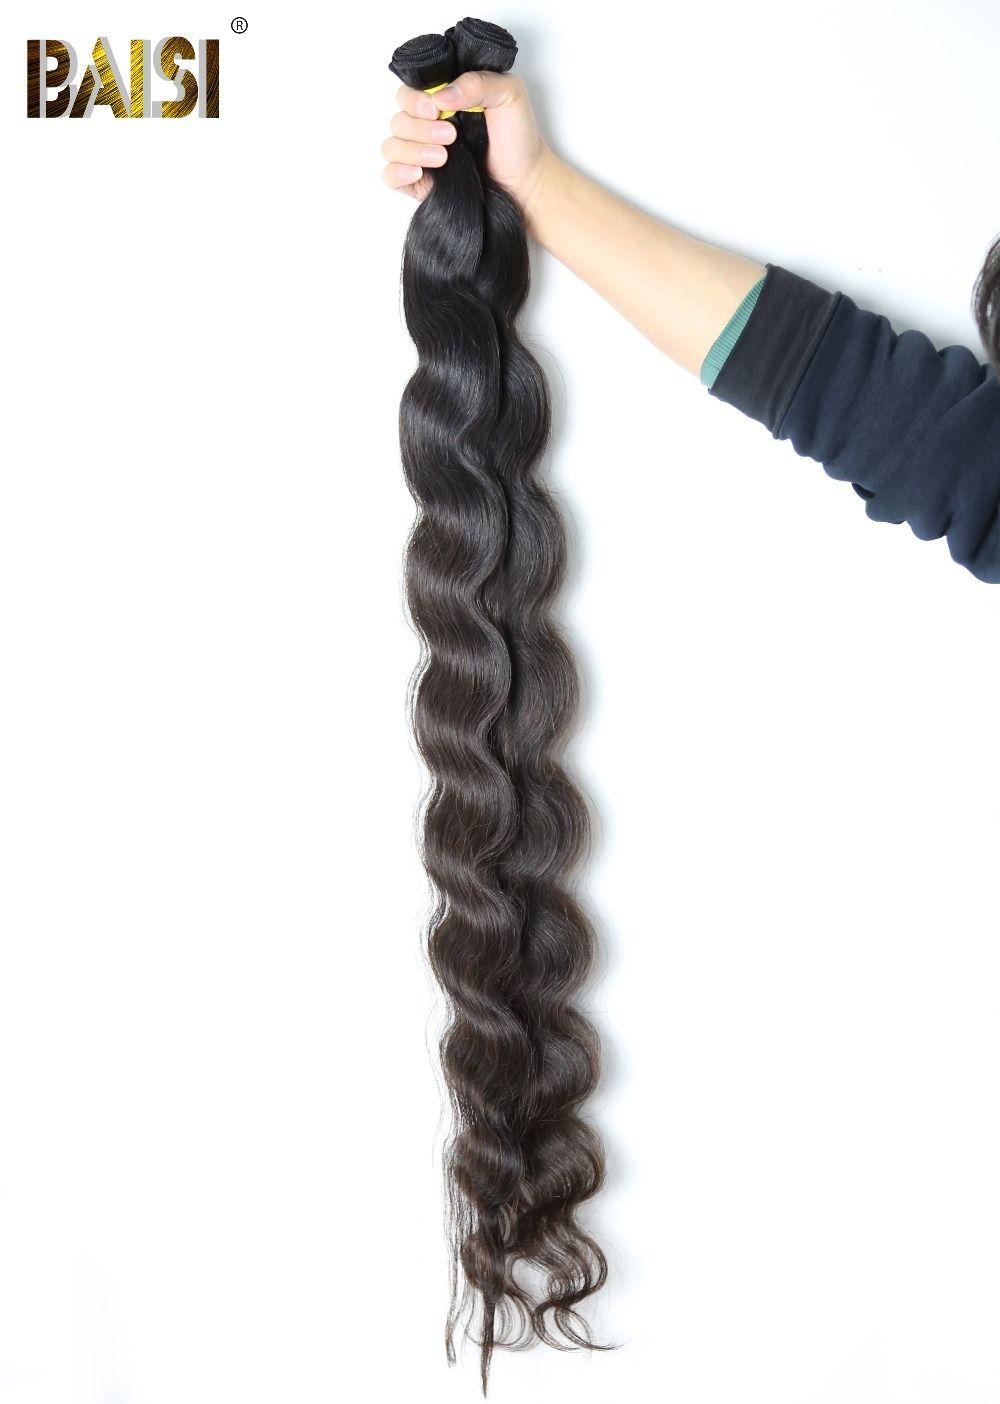 Baisi Factory Peruvian Virgin Hair Body Wave Longest Length 28